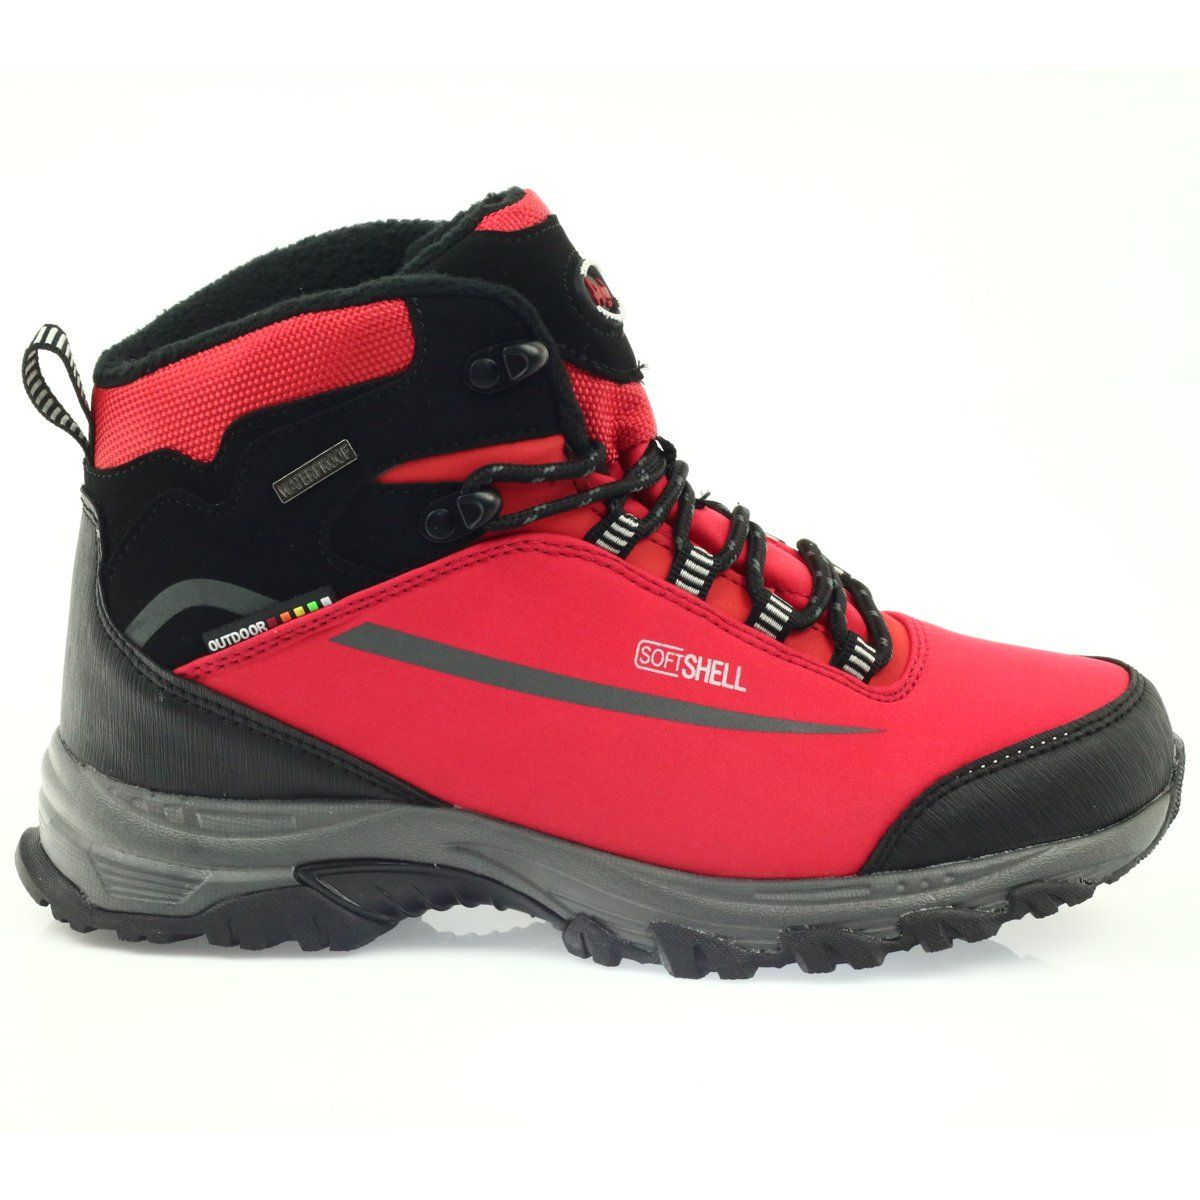 American Club Damskie Zimowe Buty American Czarne Hiking Boots Shoes Boots